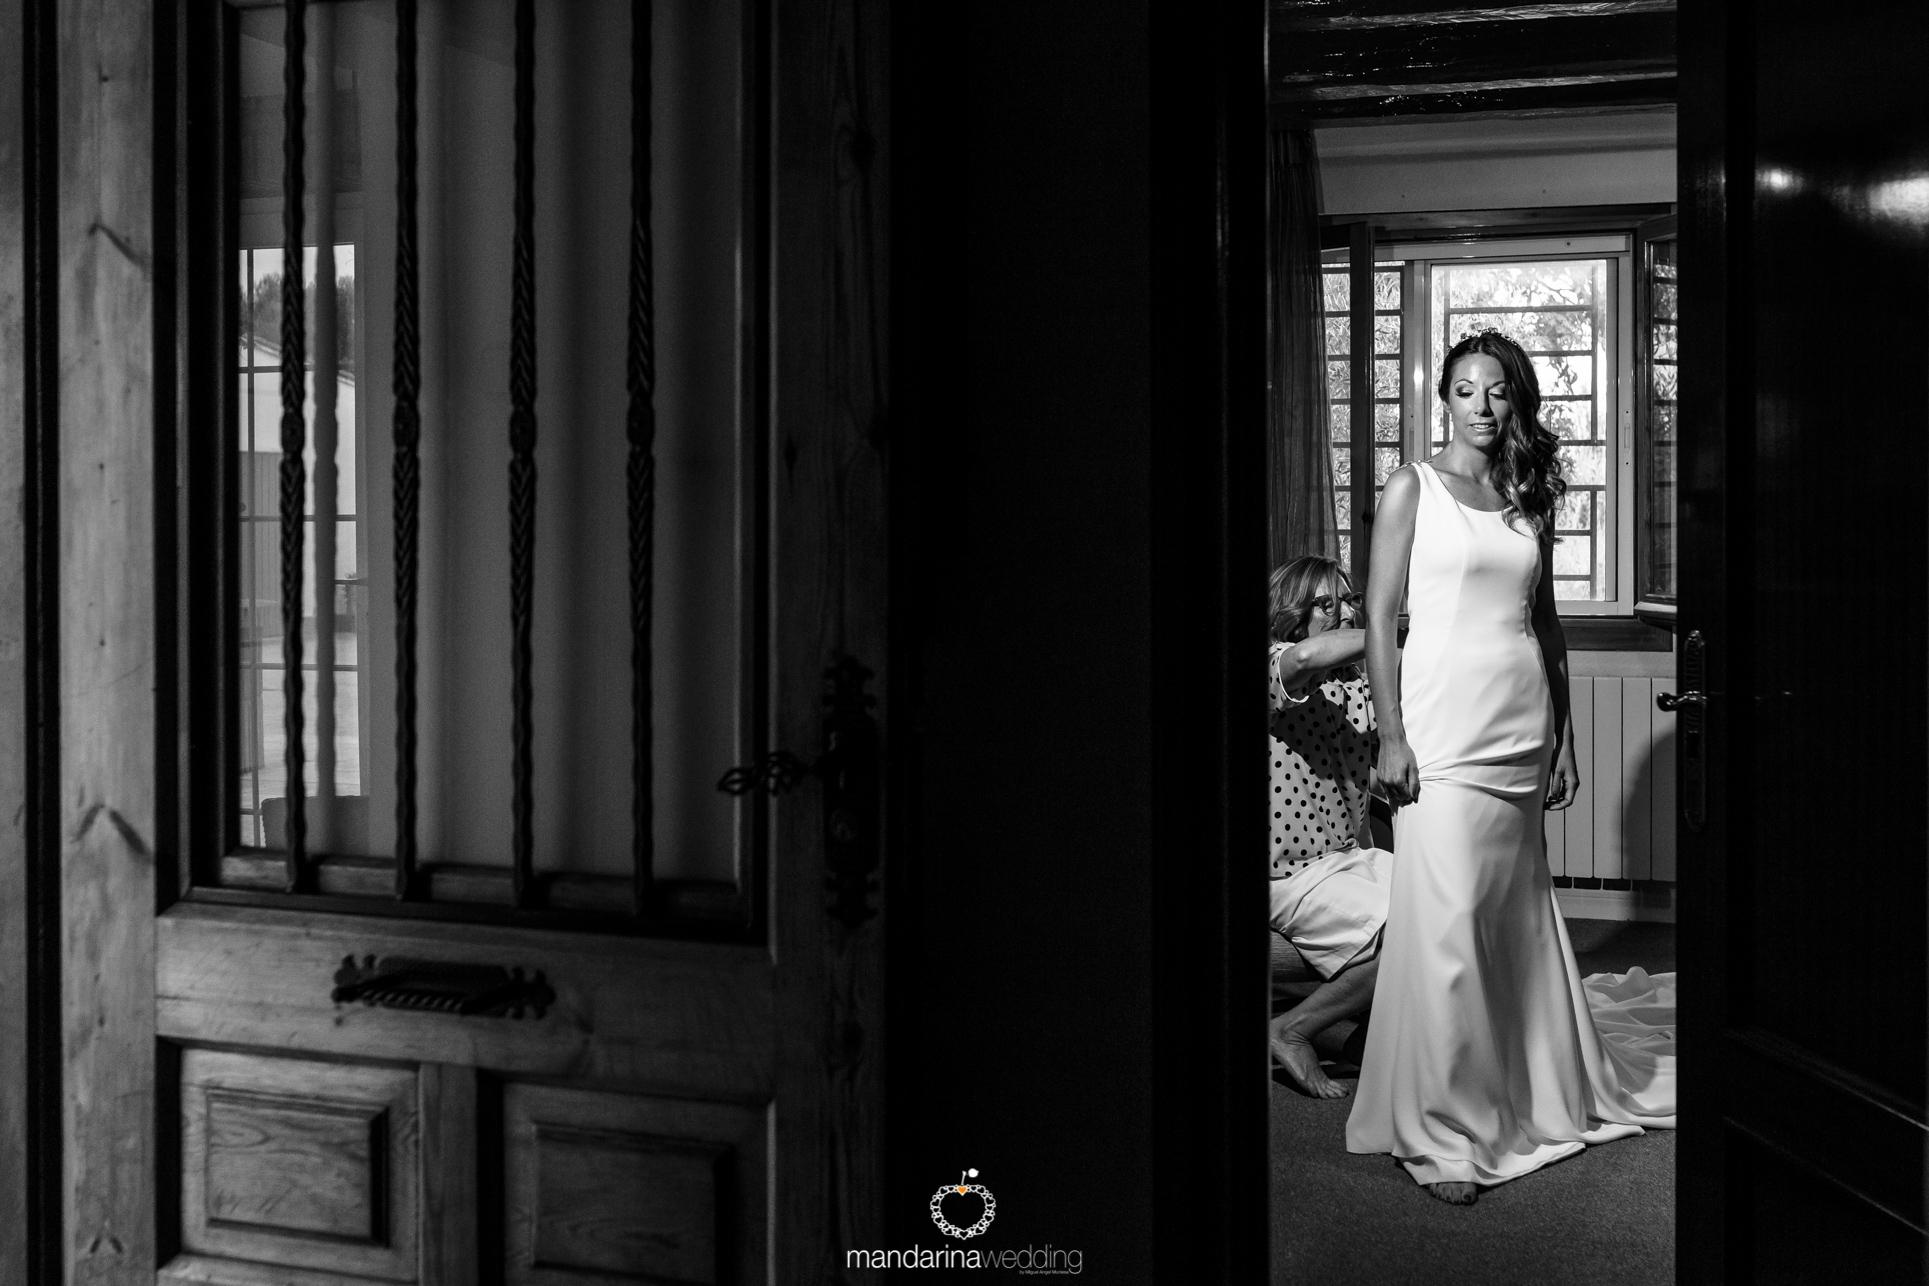 mandarina wedding, fotografo boda pais vasco, fotografo boda zaragoza, fotógrafo boda soria, fotografo boda Madrid, fotógrafo boda tarragona-23